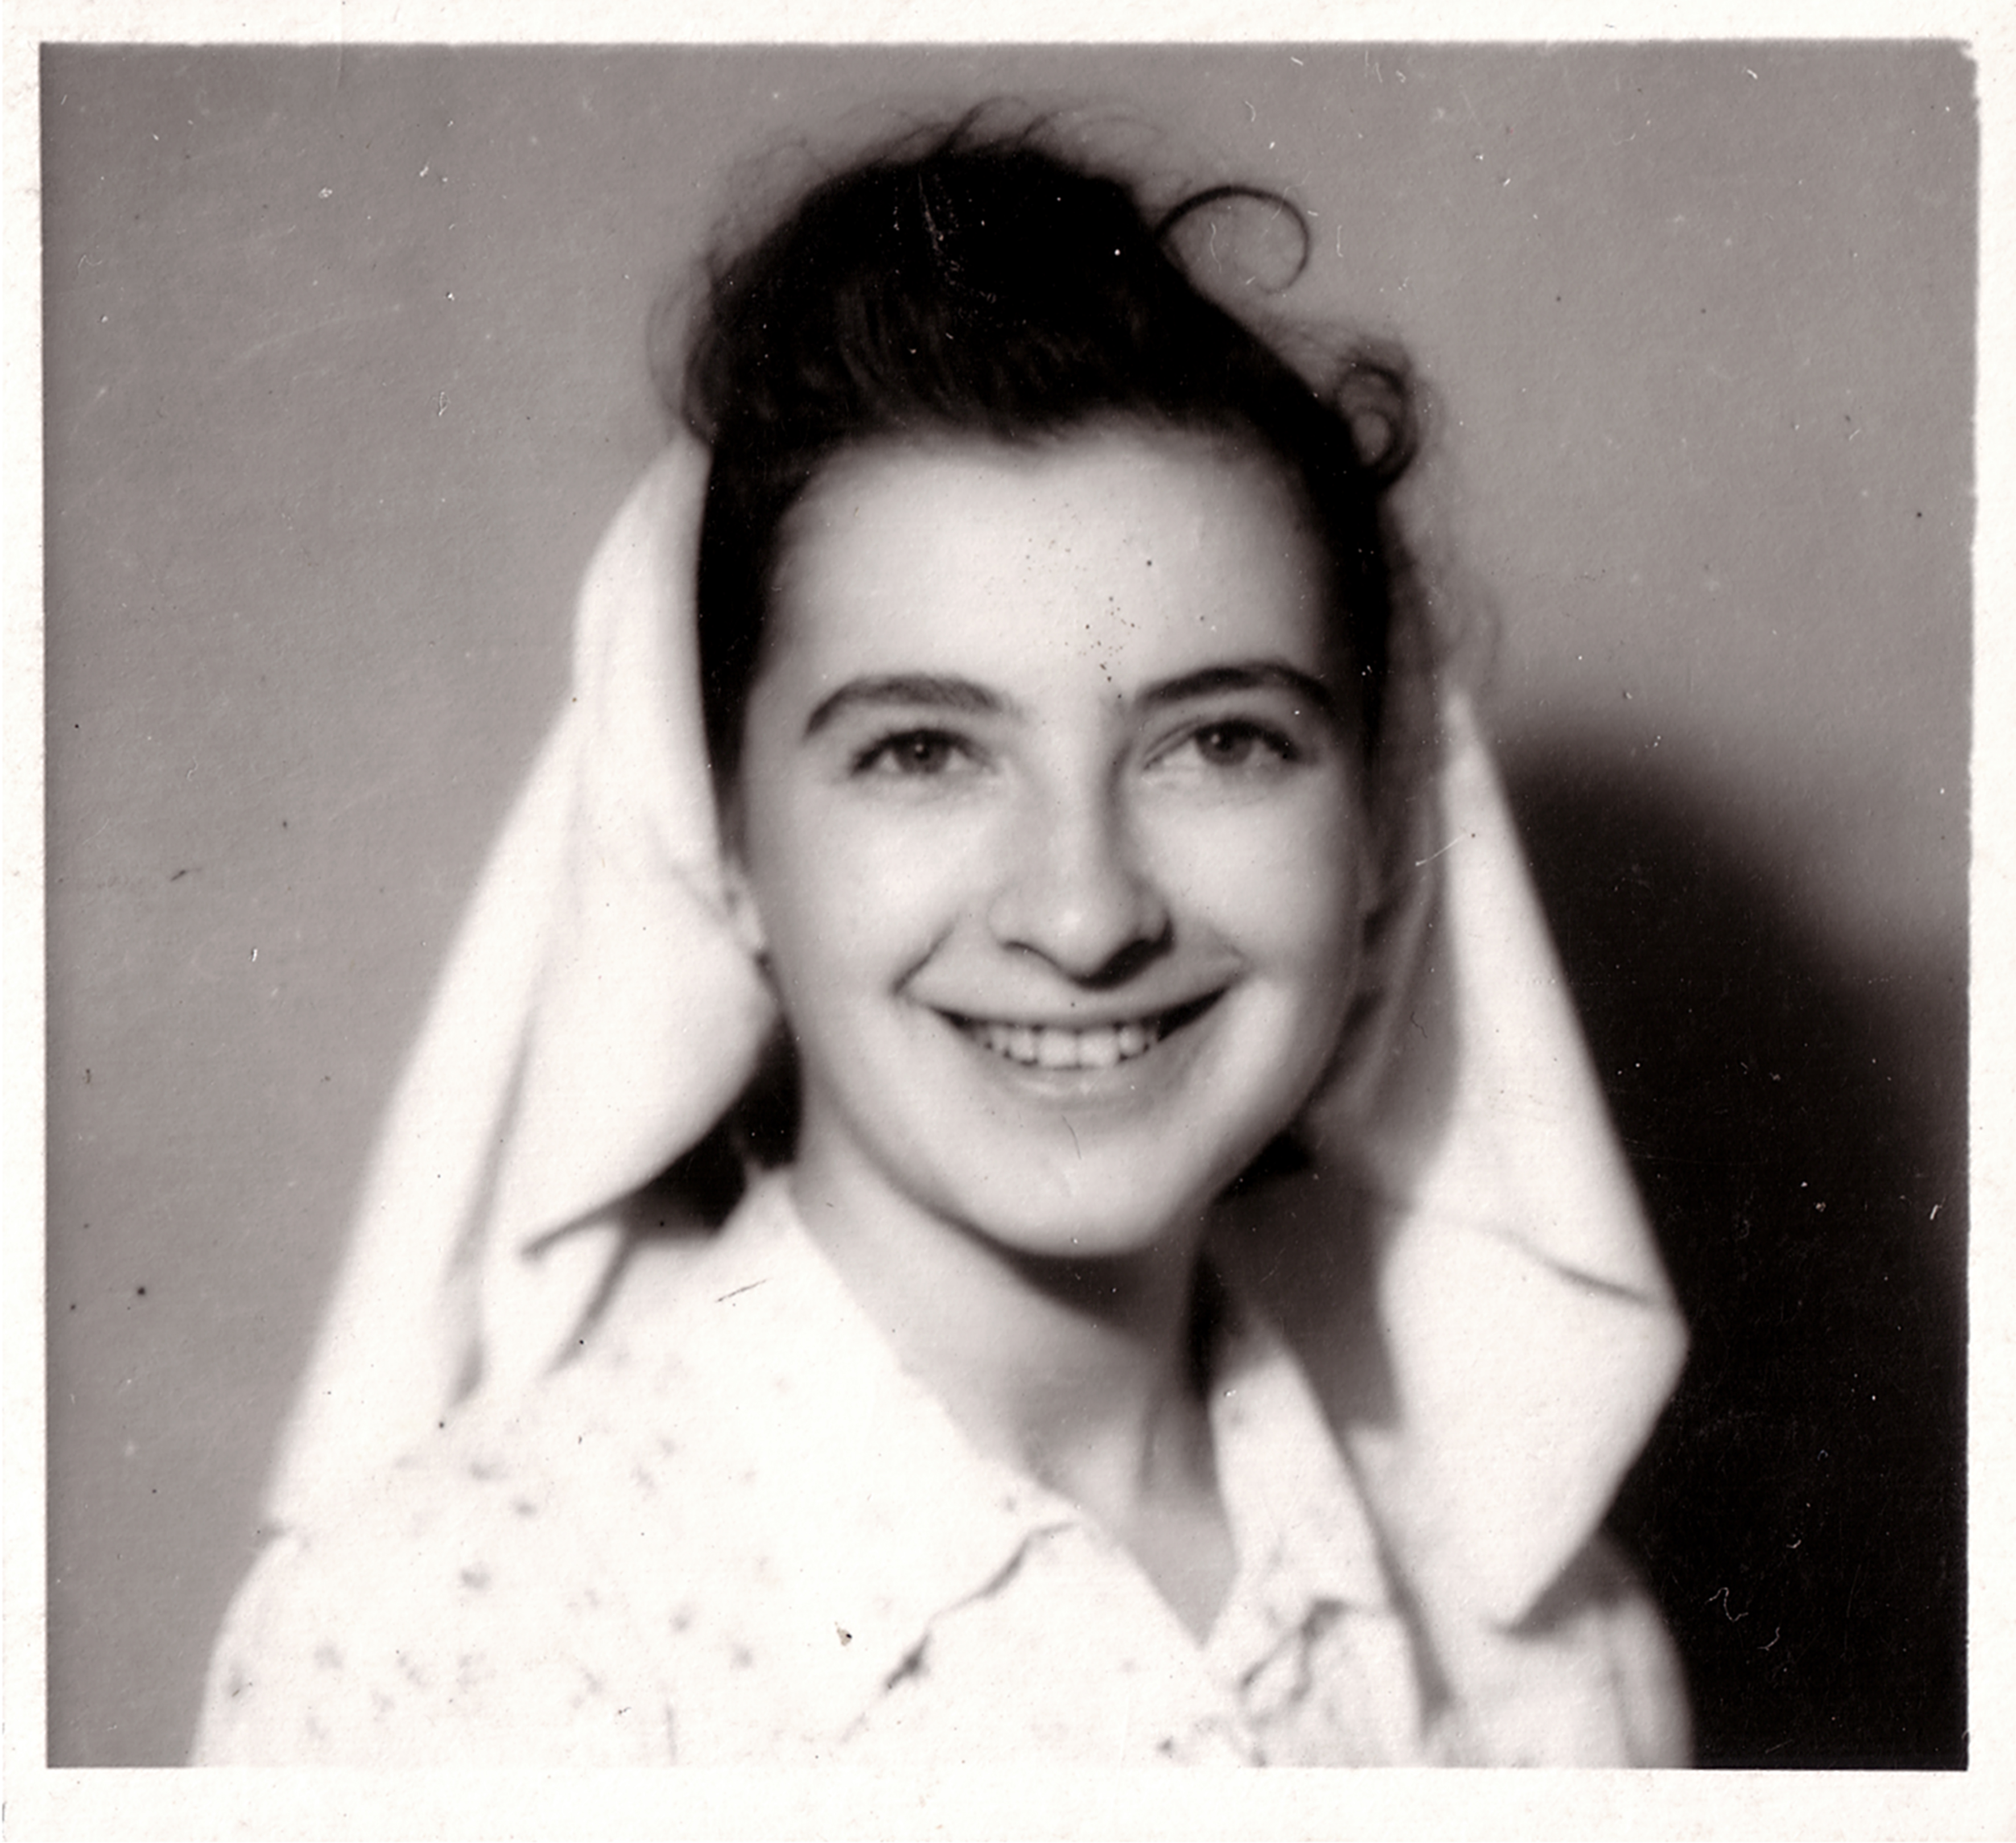 G. A-né mint ápolónõ